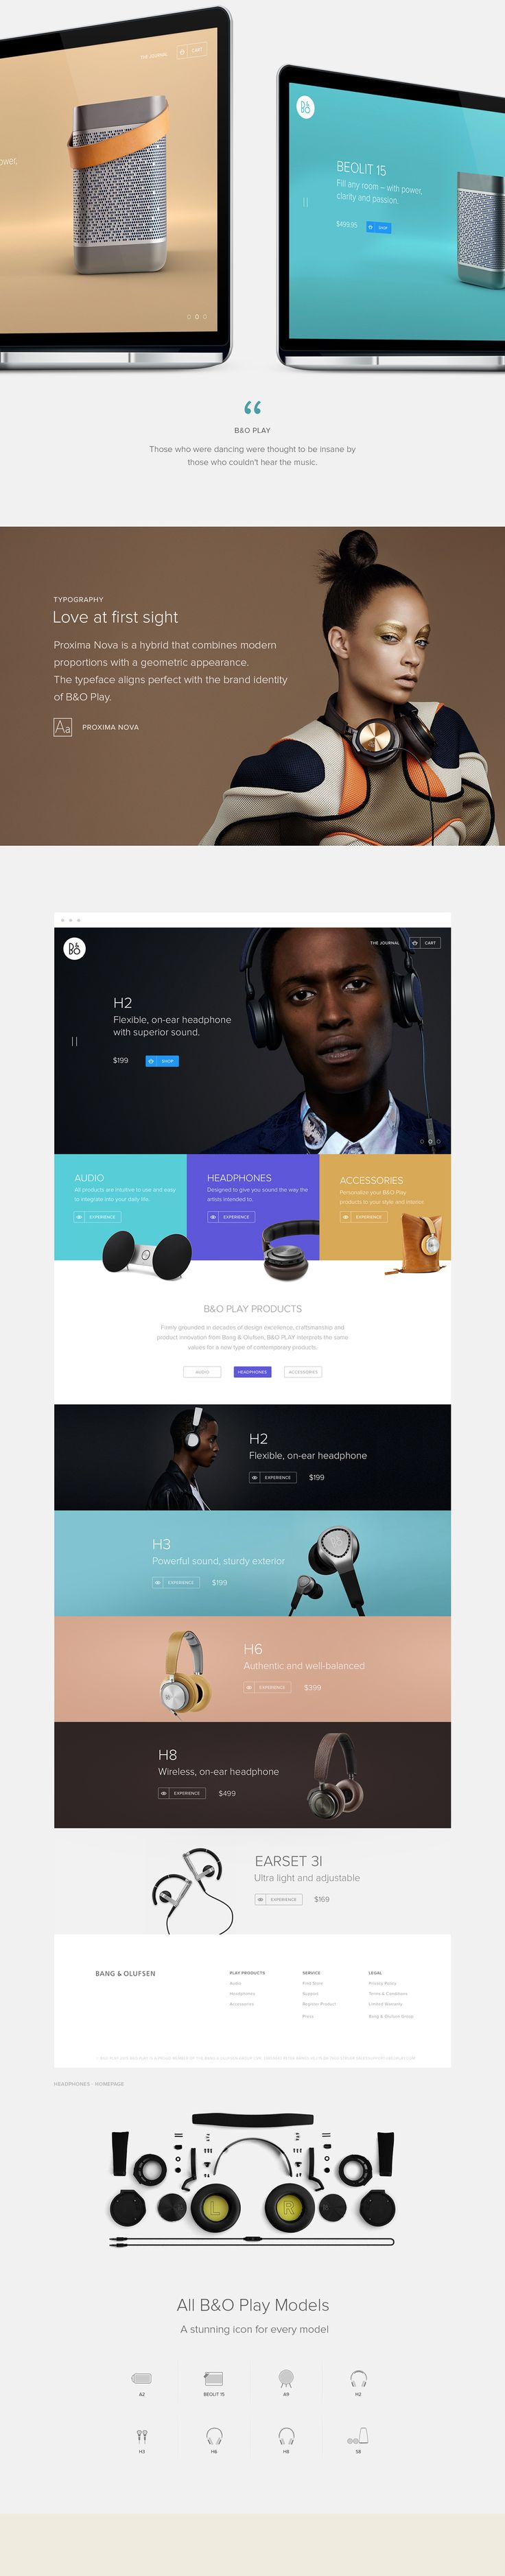 B&O Play - Design for music on Web Design Served